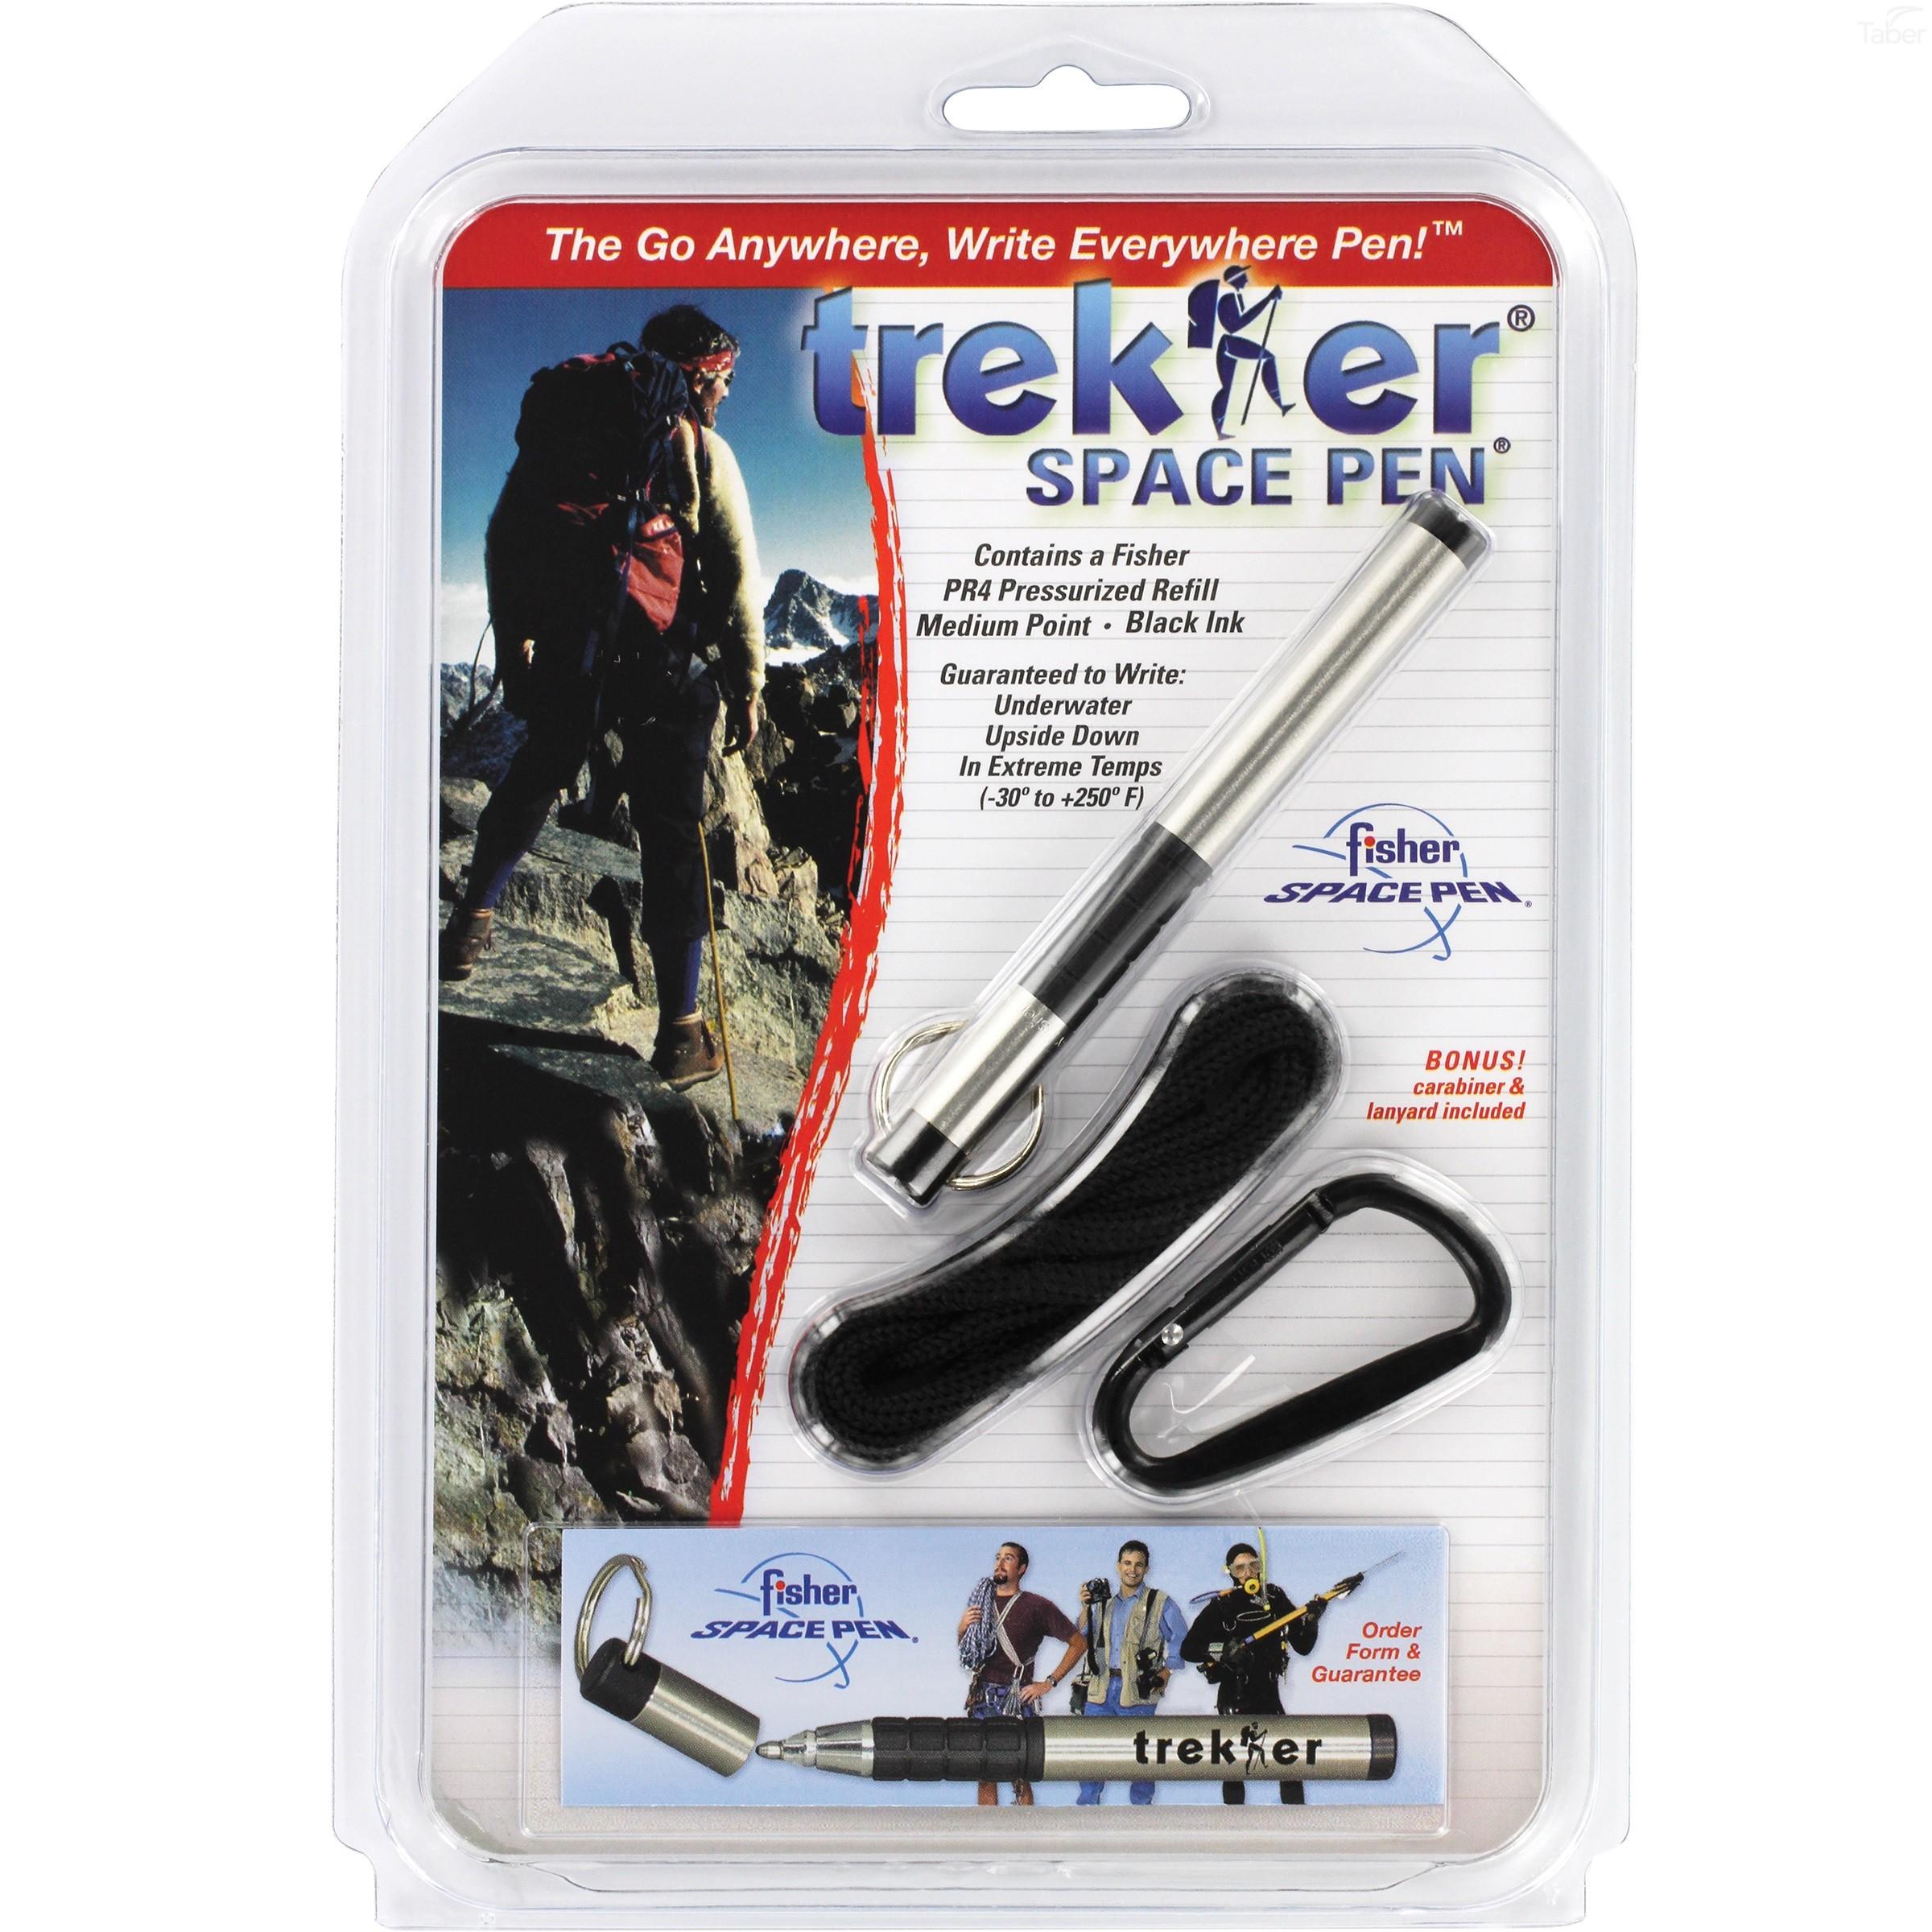 Fisher Trekker Space Pen